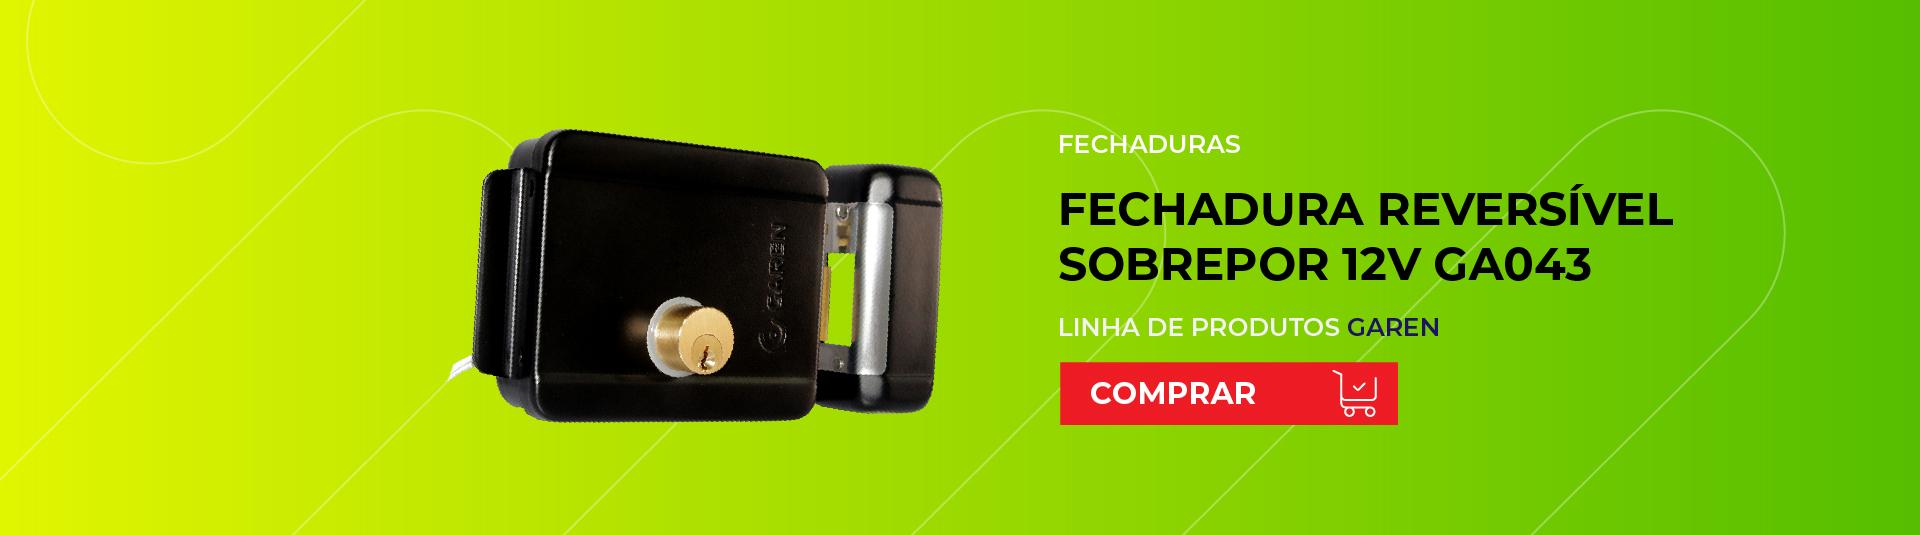 Full Fechadura